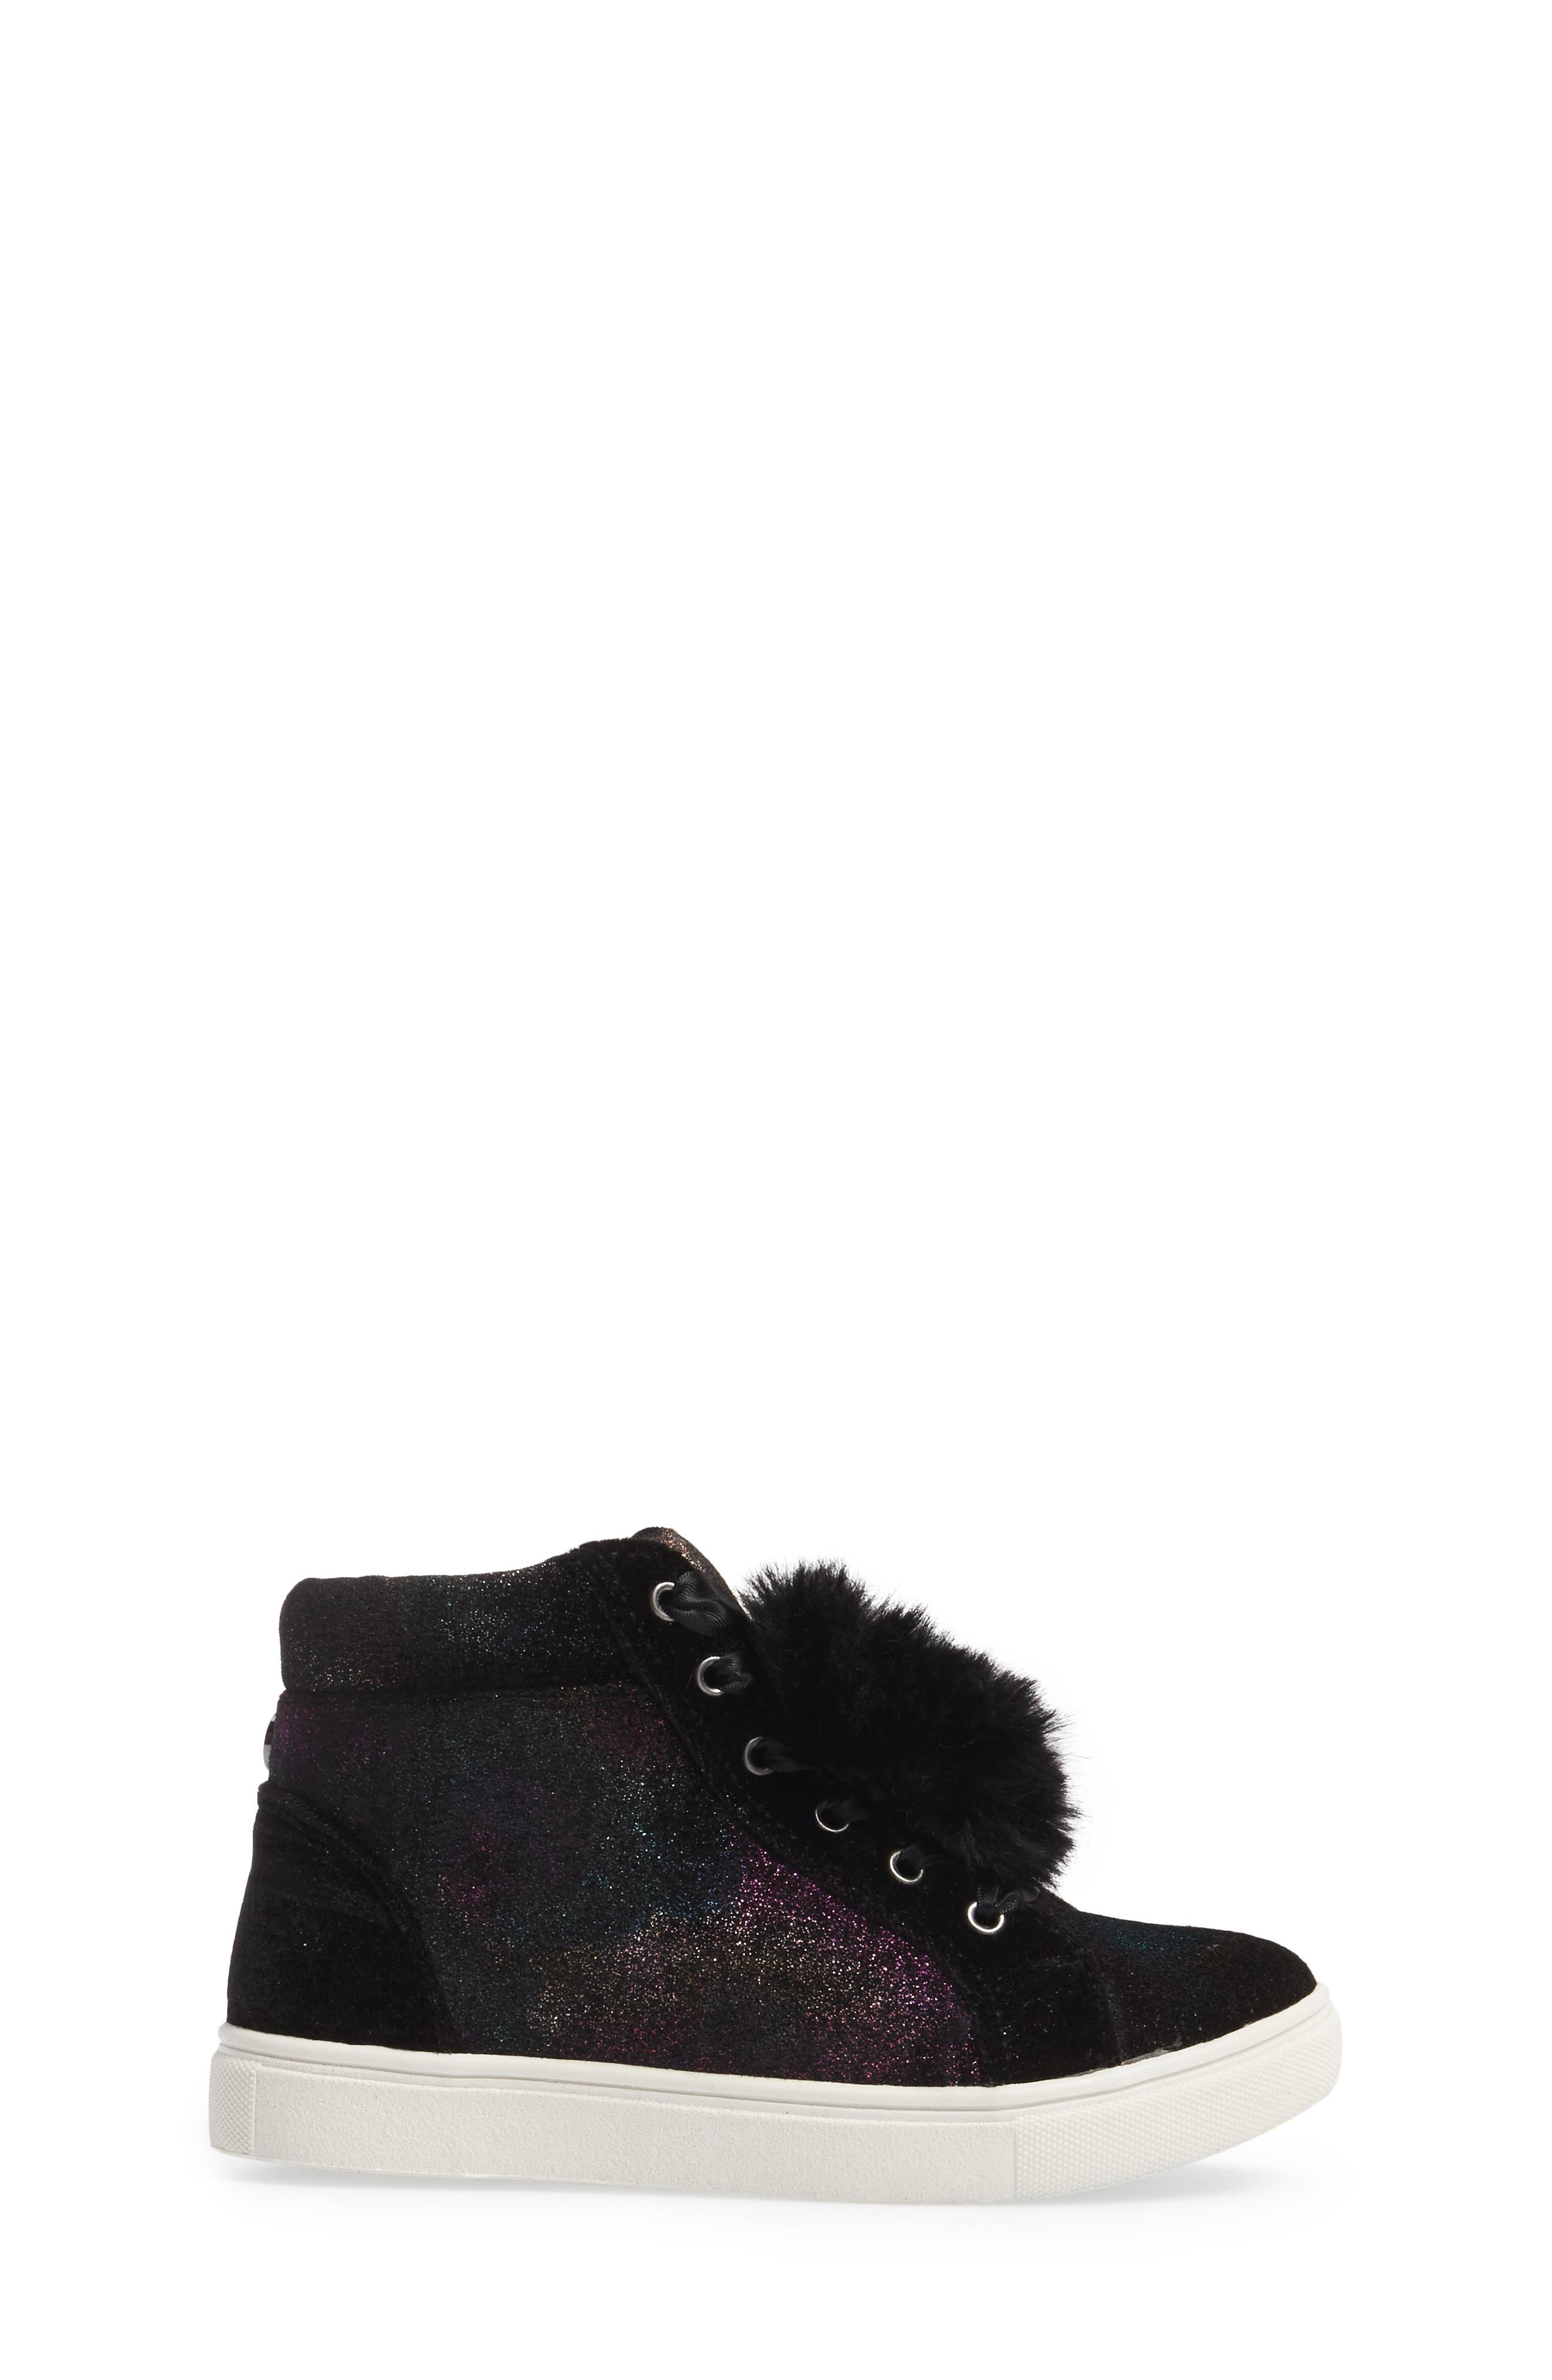 JBrielle High Top Sneaker,                             Alternate thumbnail 3, color,                             015